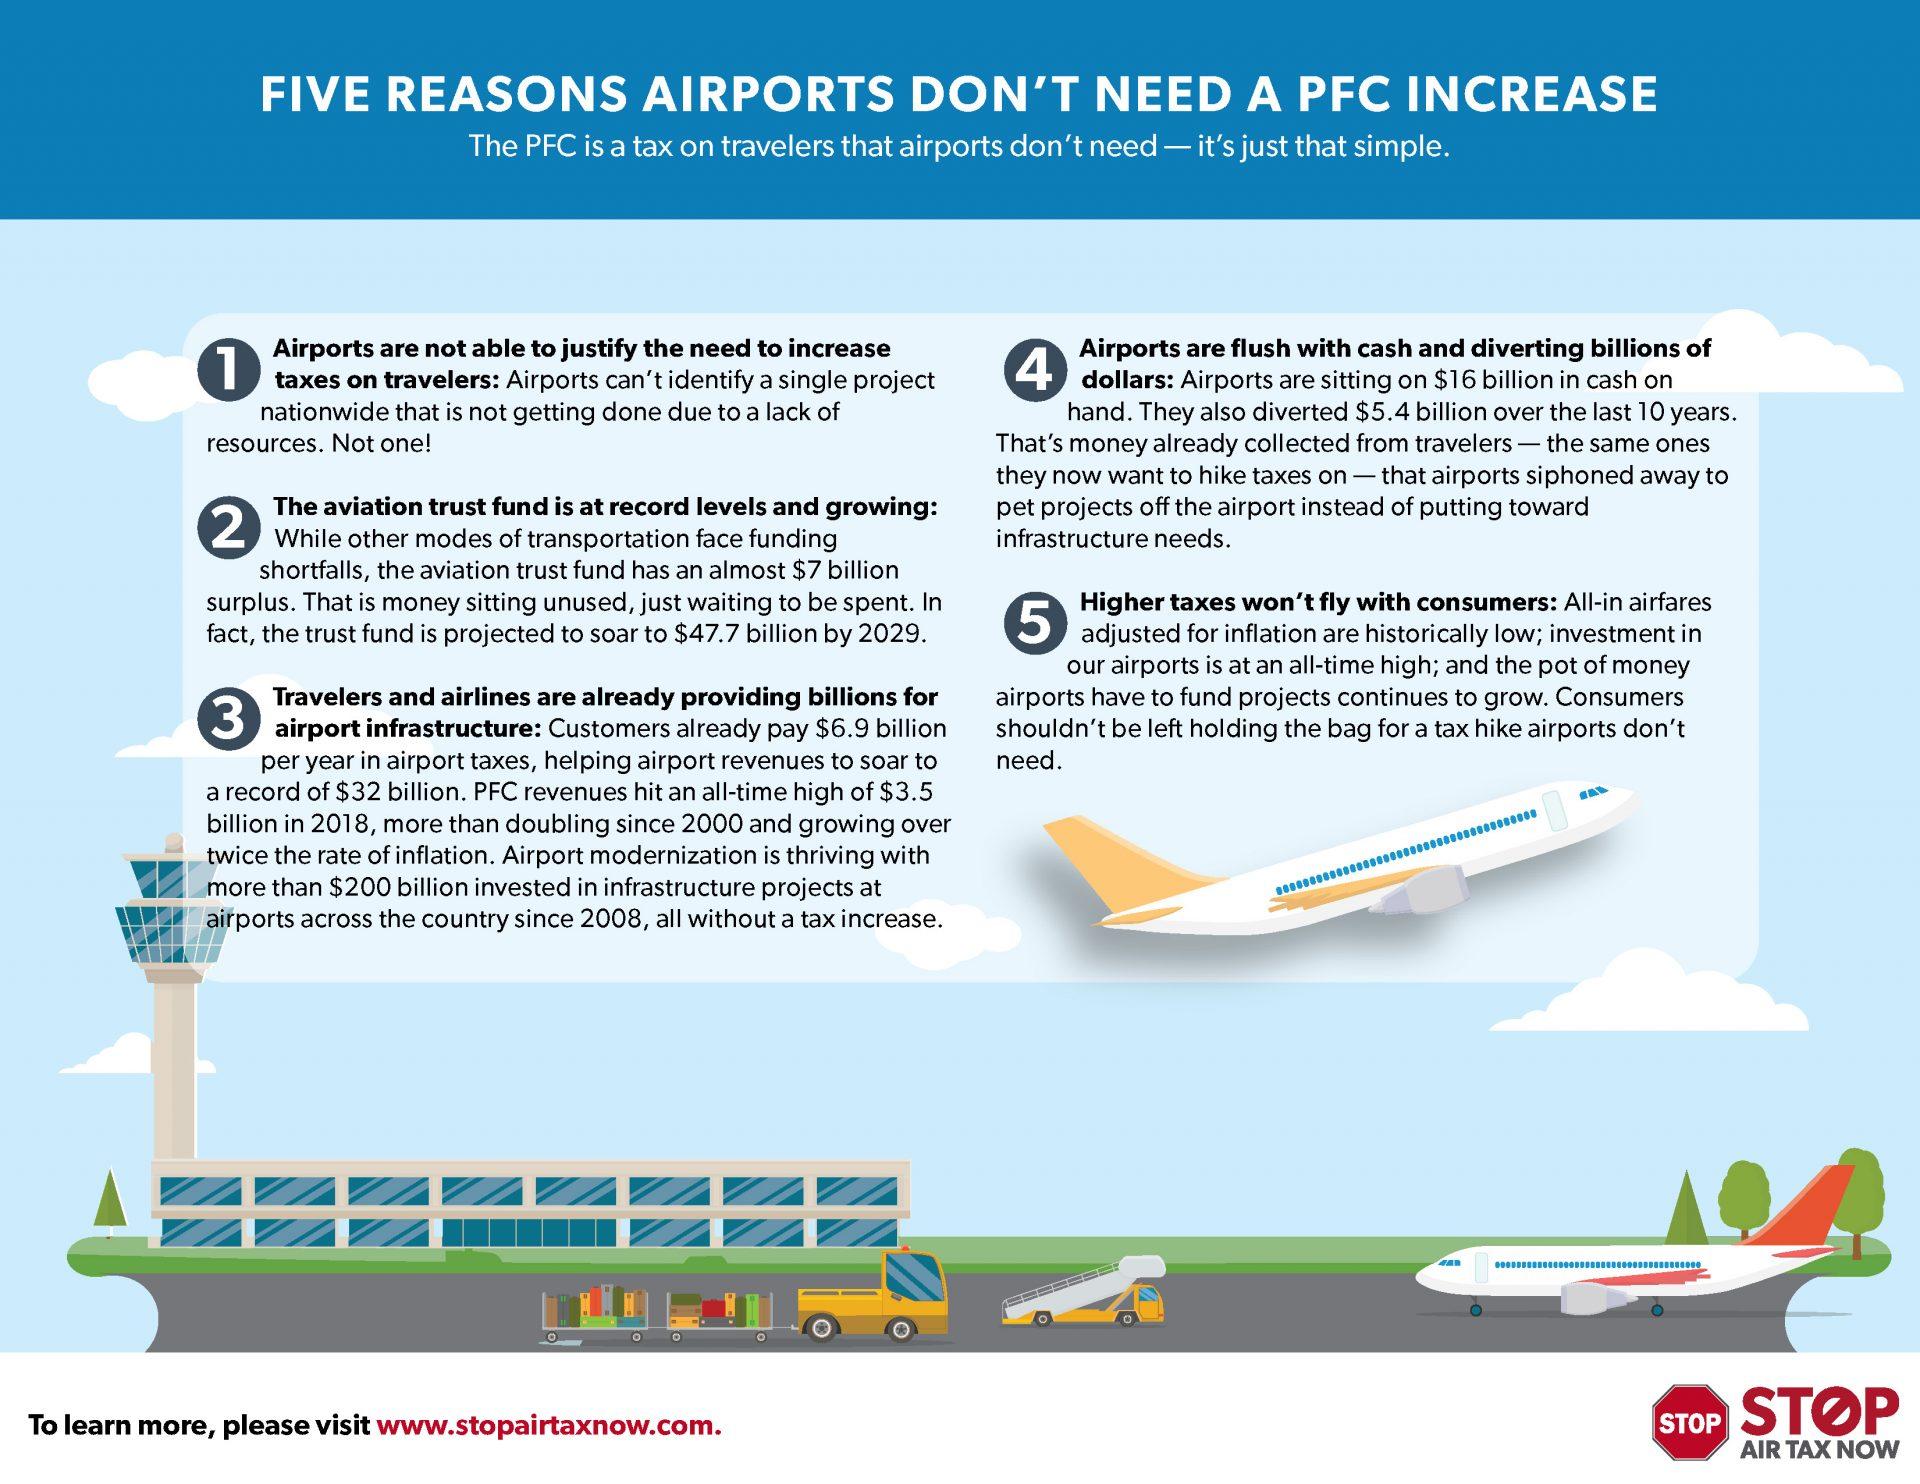 Five Reasons Airports Don't Need A PFC Increase.